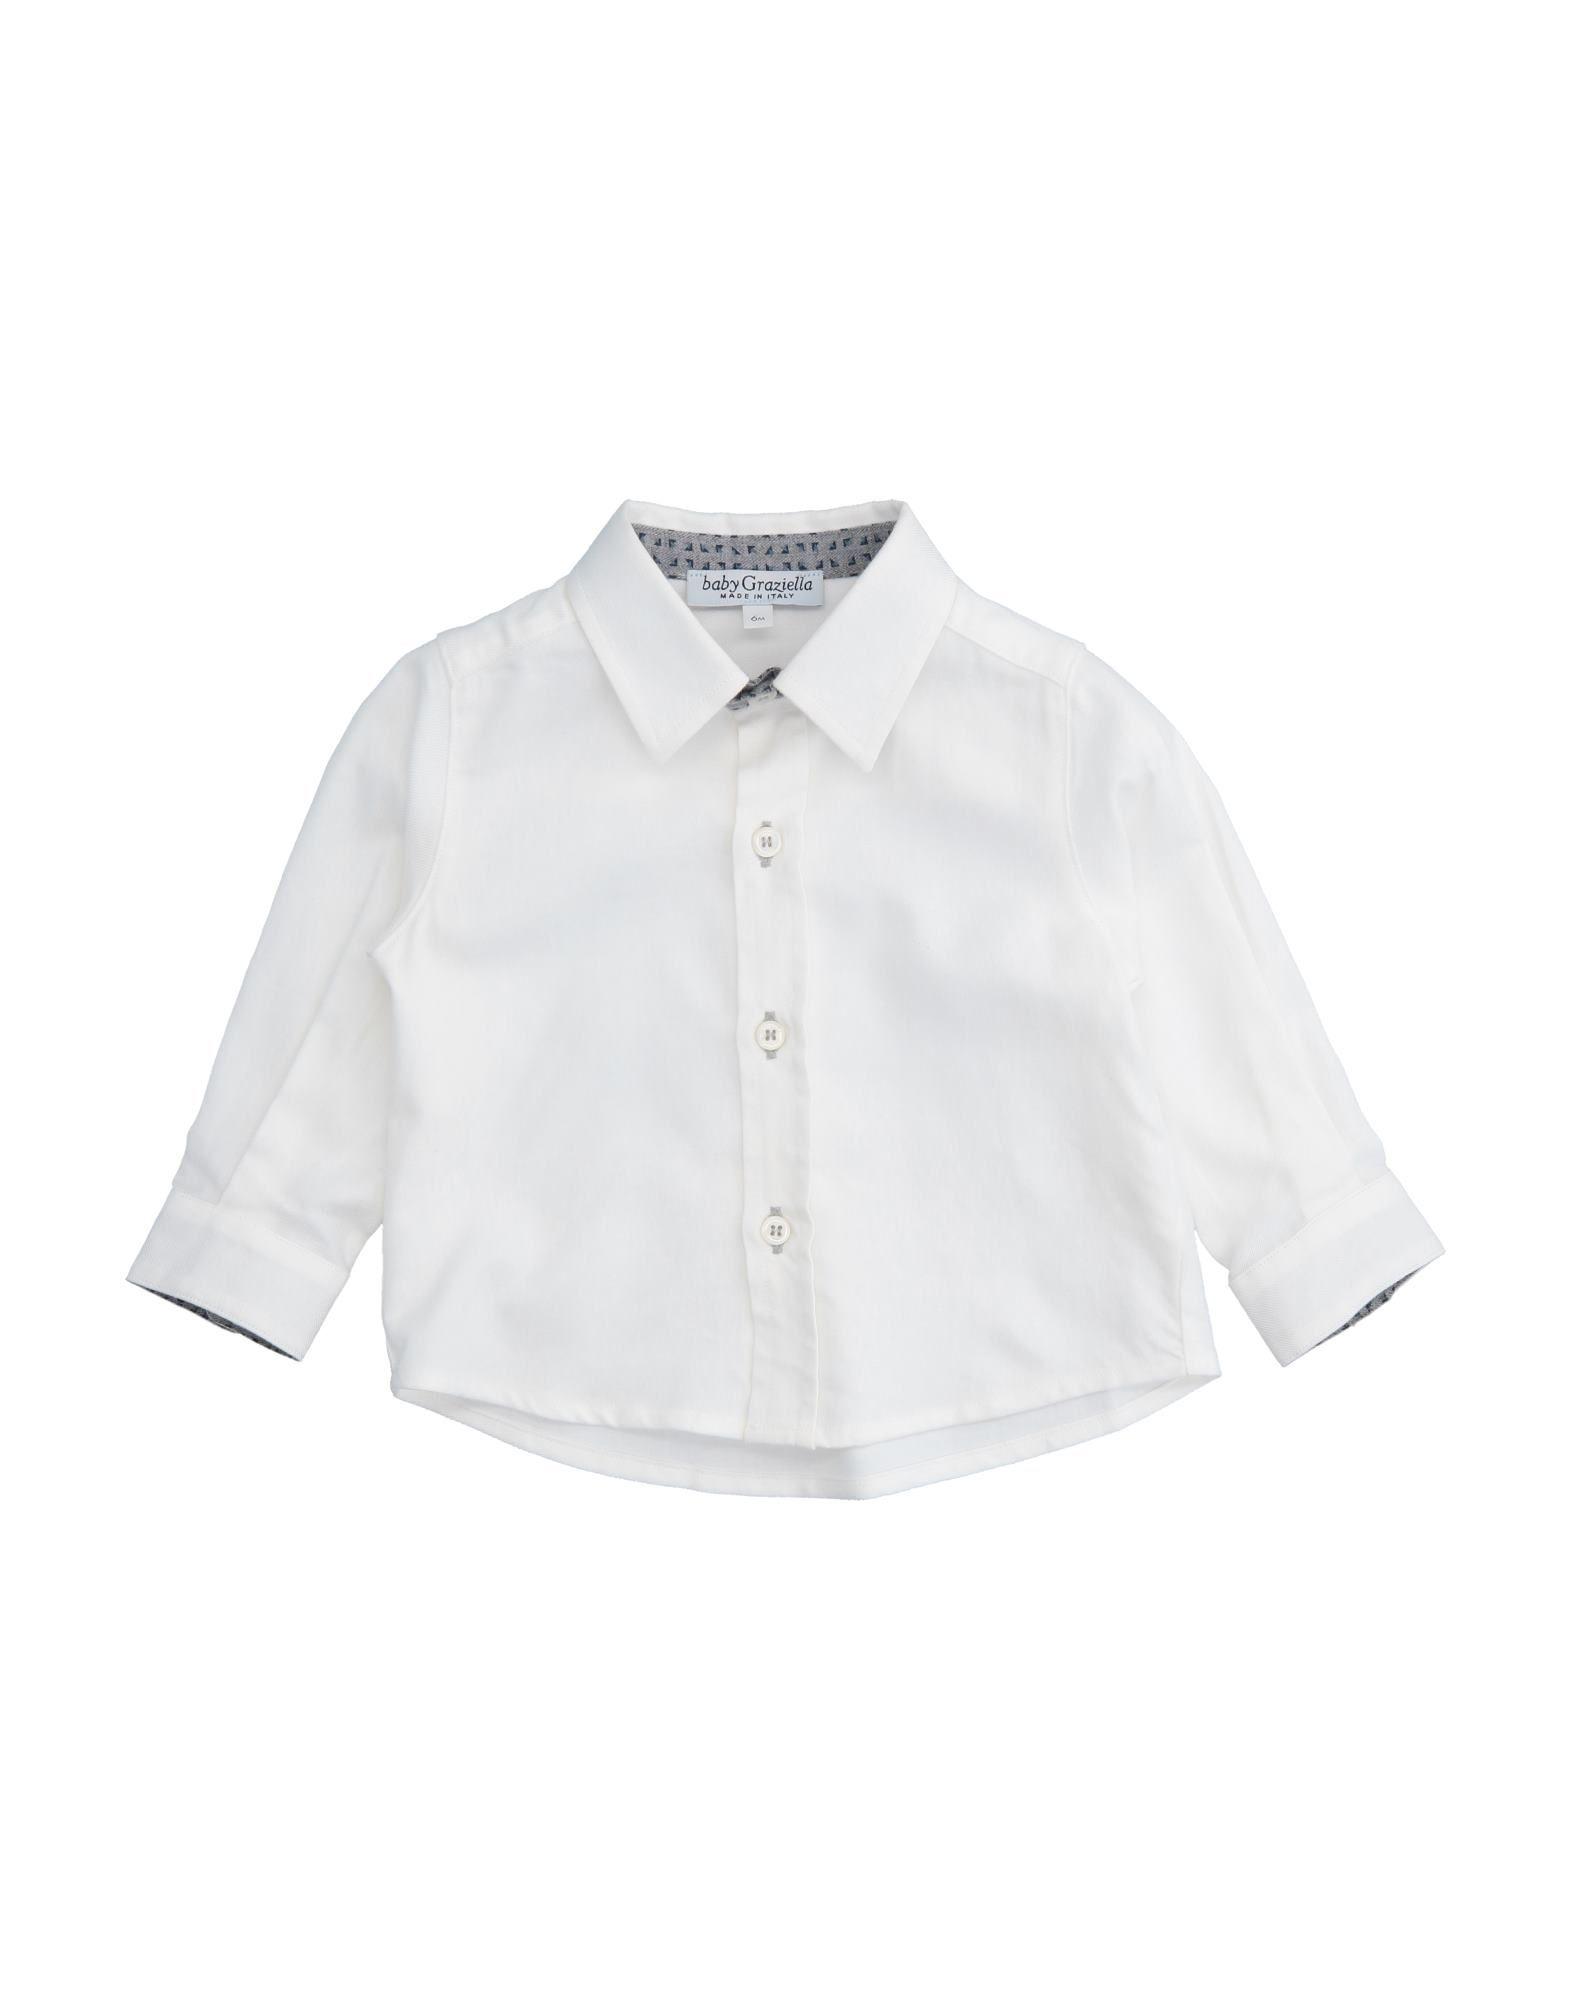 BABY GRAZIELLA Shirts - Item 38828612